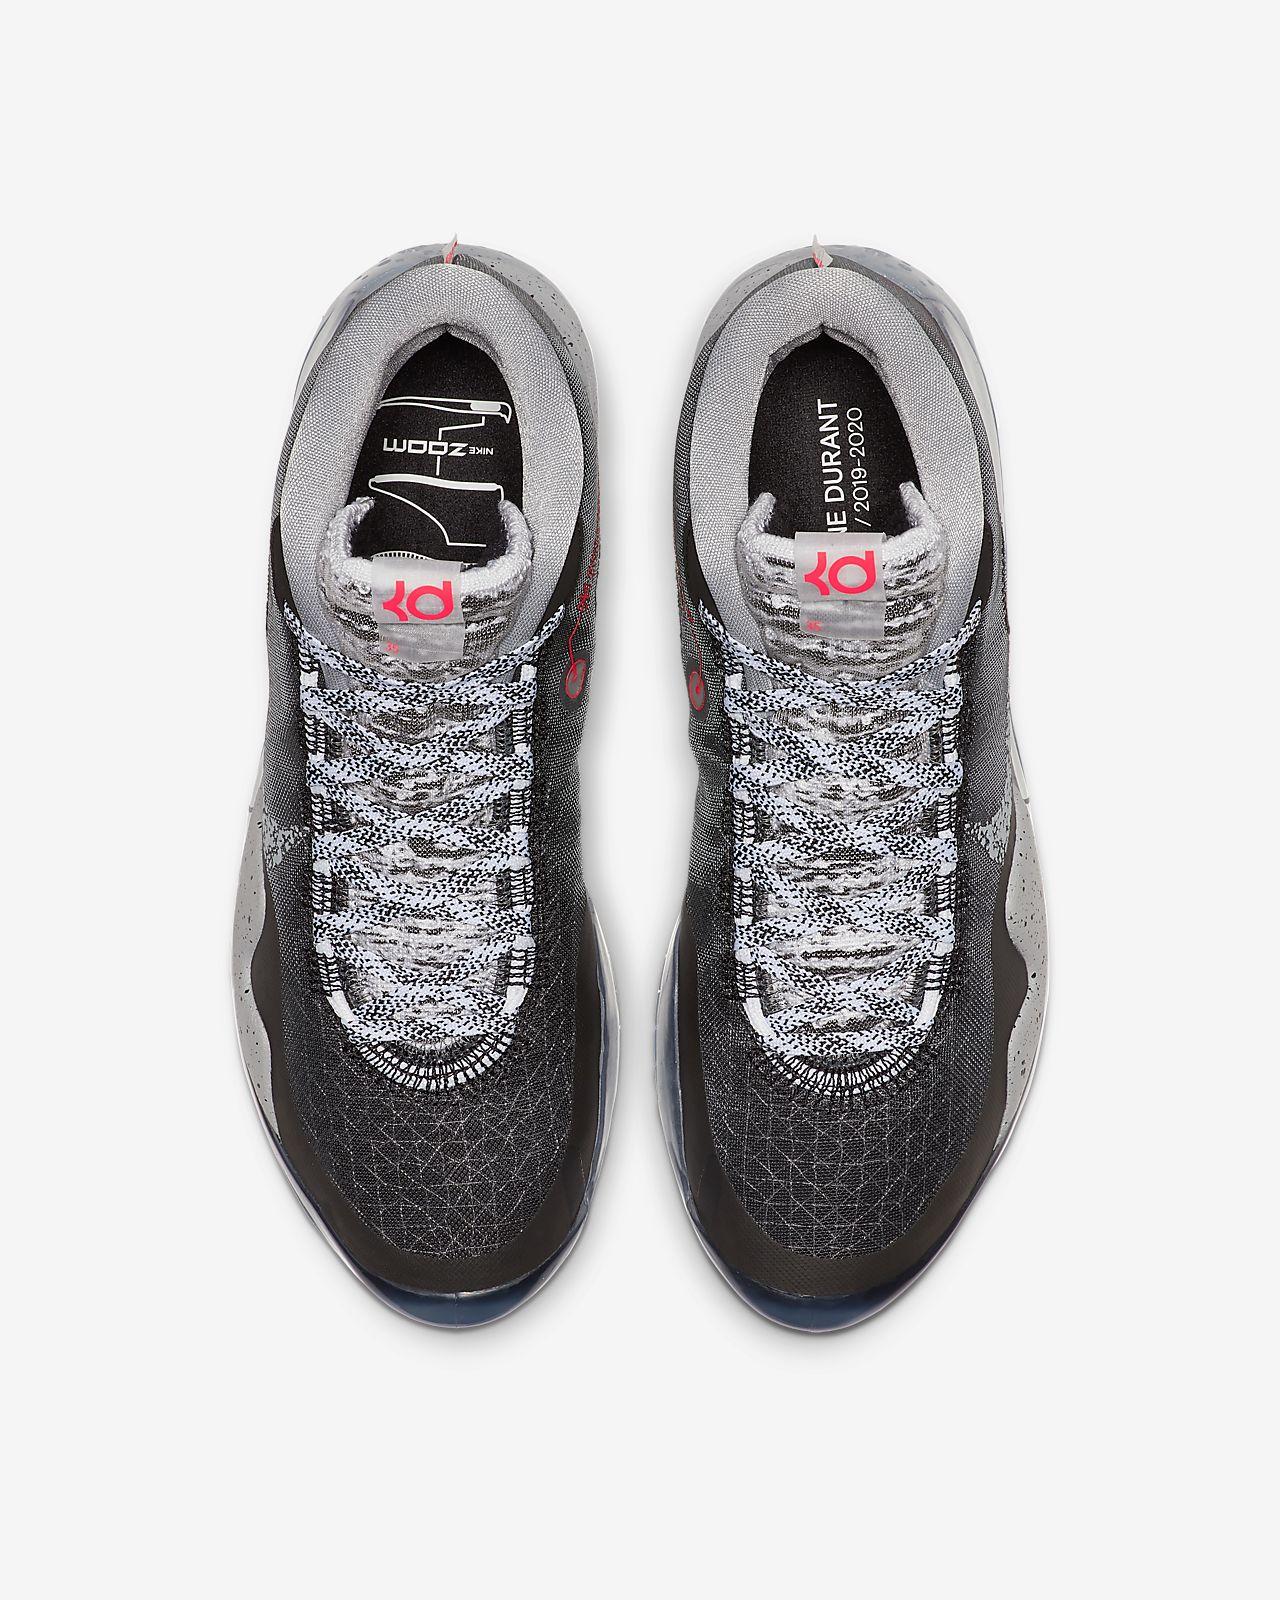 Zoom Chaussure Nike De Basketball Kd12 0wOk8nXZNP